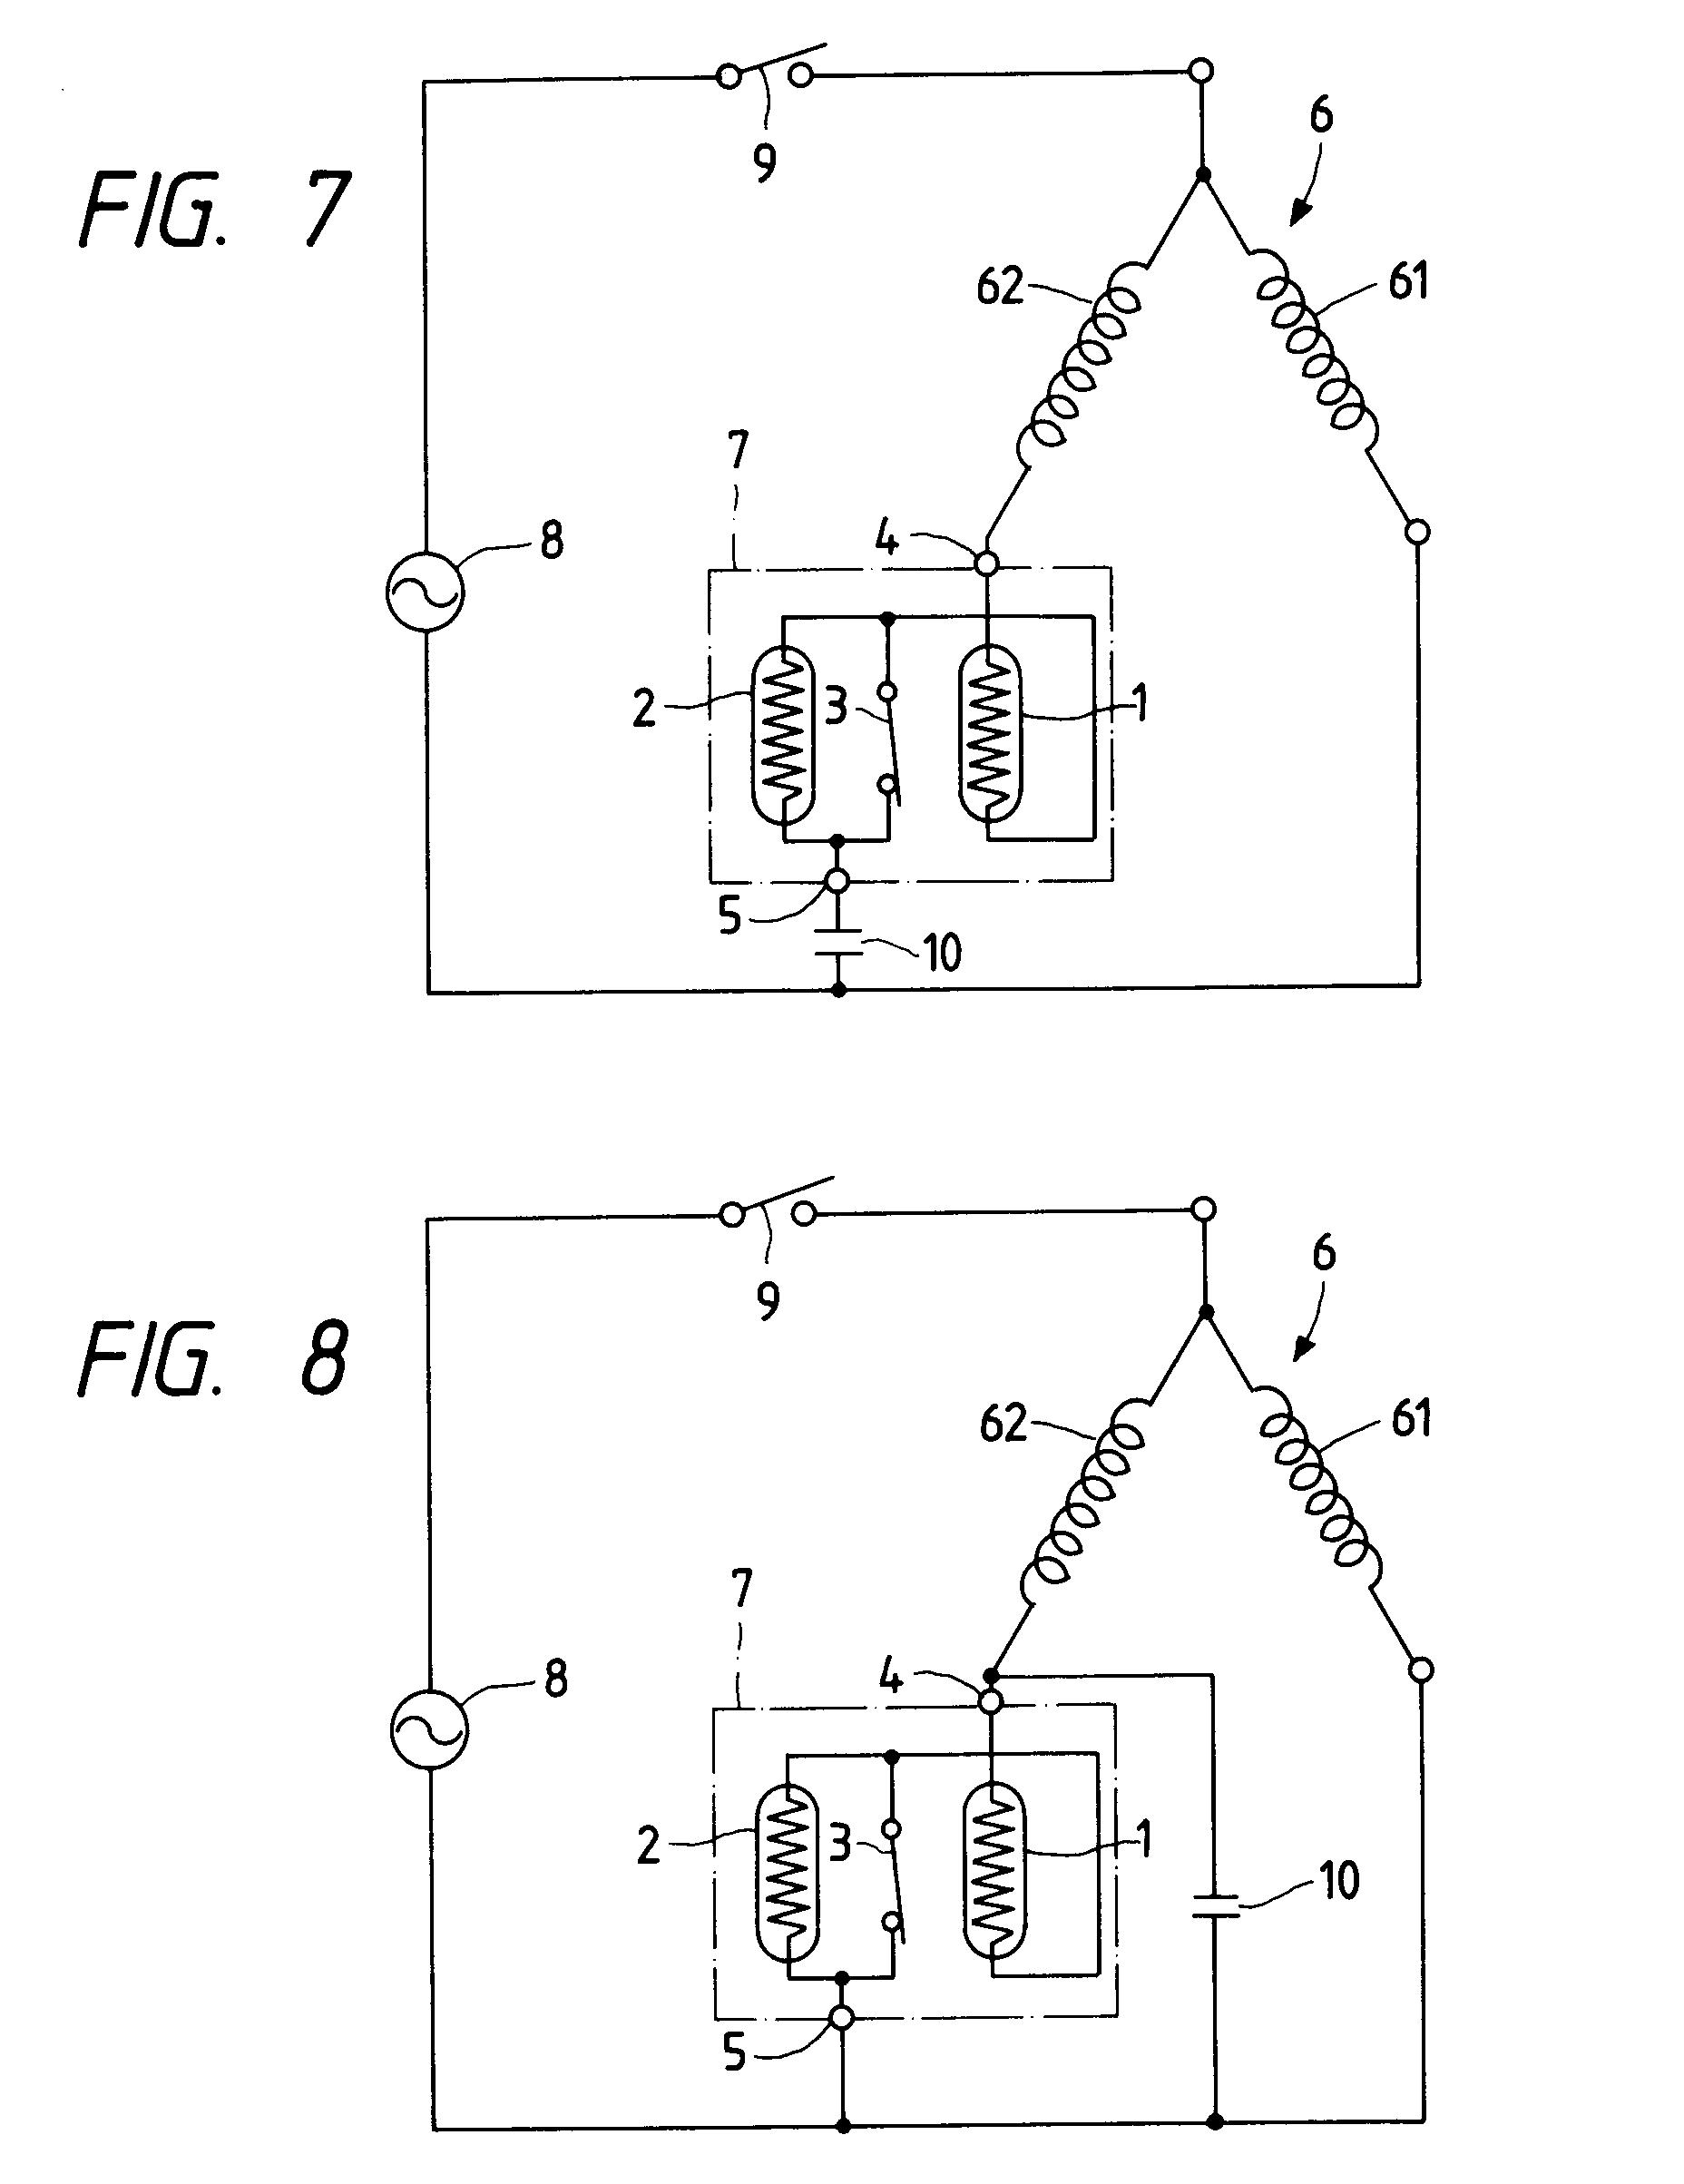 Patent Ep0590592a1 - Motor Starting Relay Device Having Ptc Thermistors